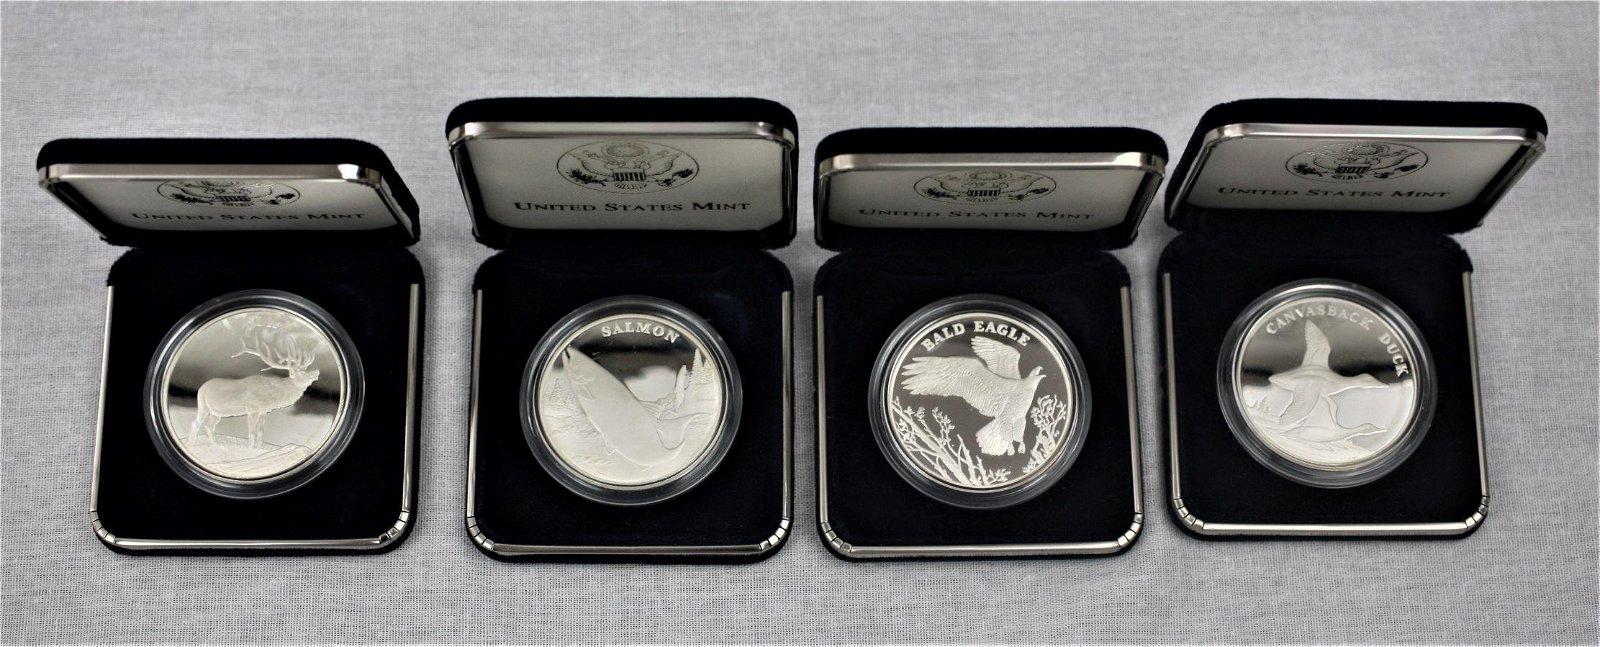 2003 Silver National Wildlife Refuge Centennial Medals